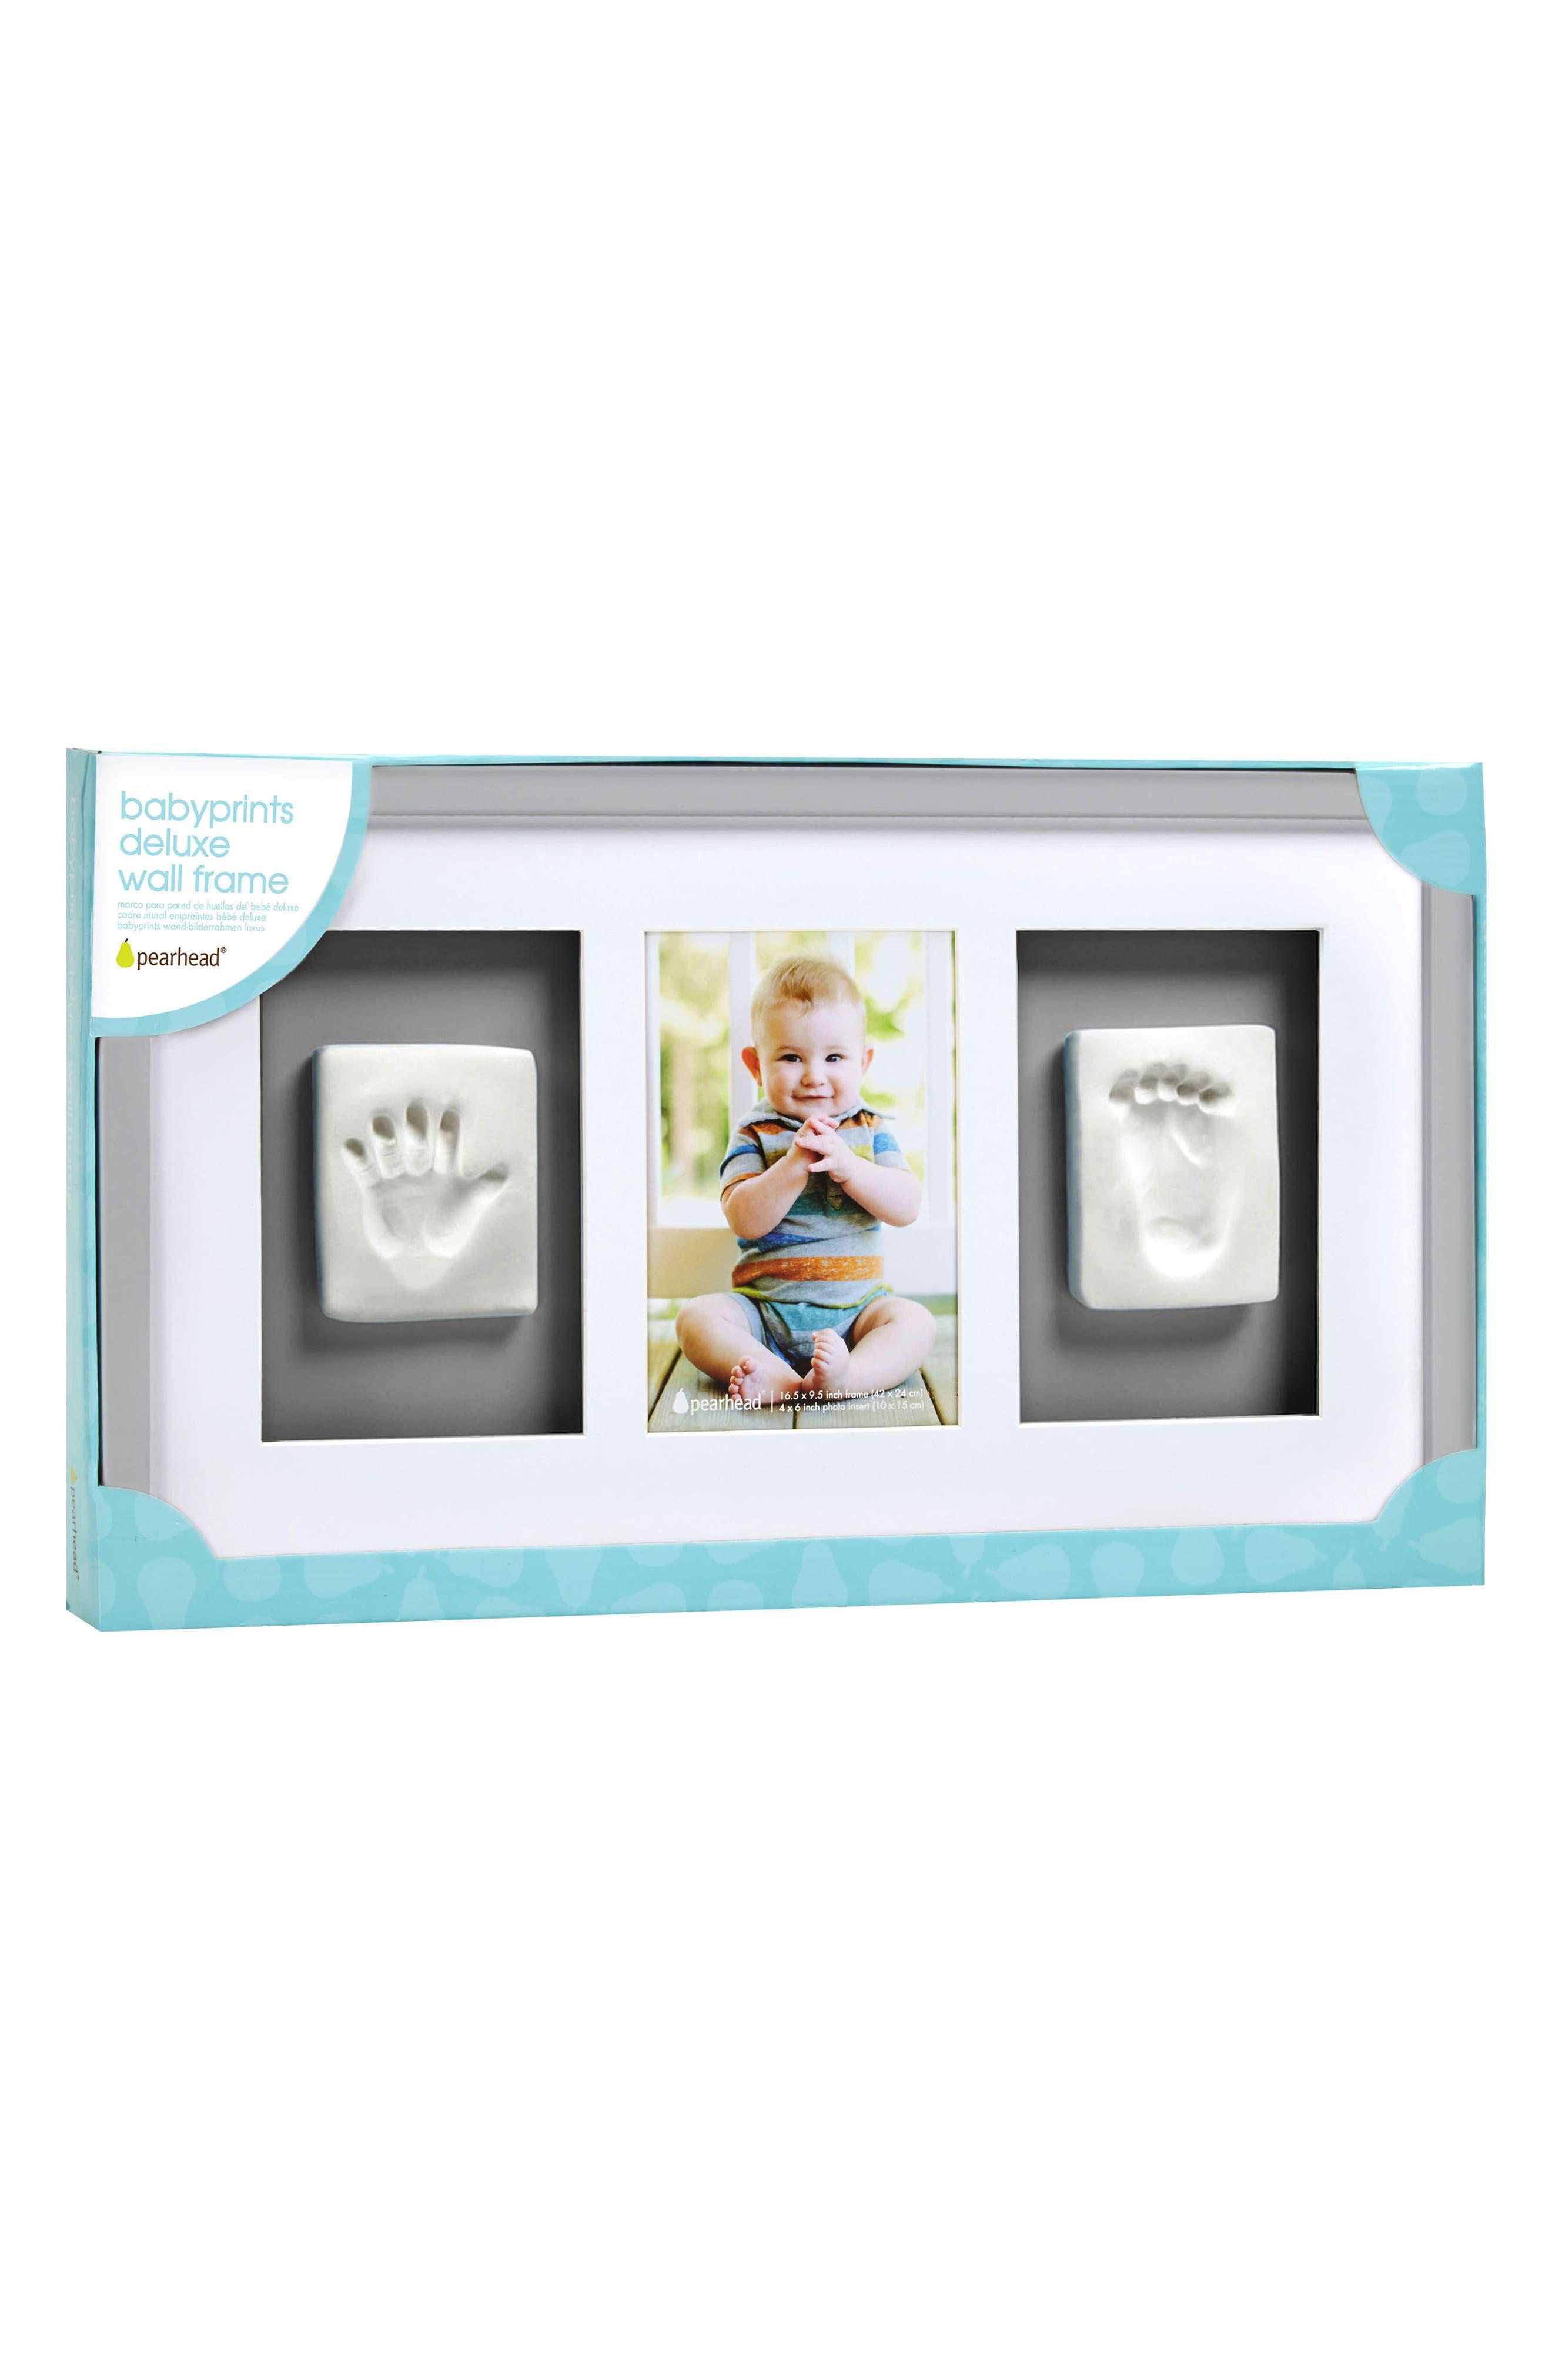 PEARHEAD, Babyprints Deluxe Wall Frame Kit, Alternate thumbnail 2, color, 020